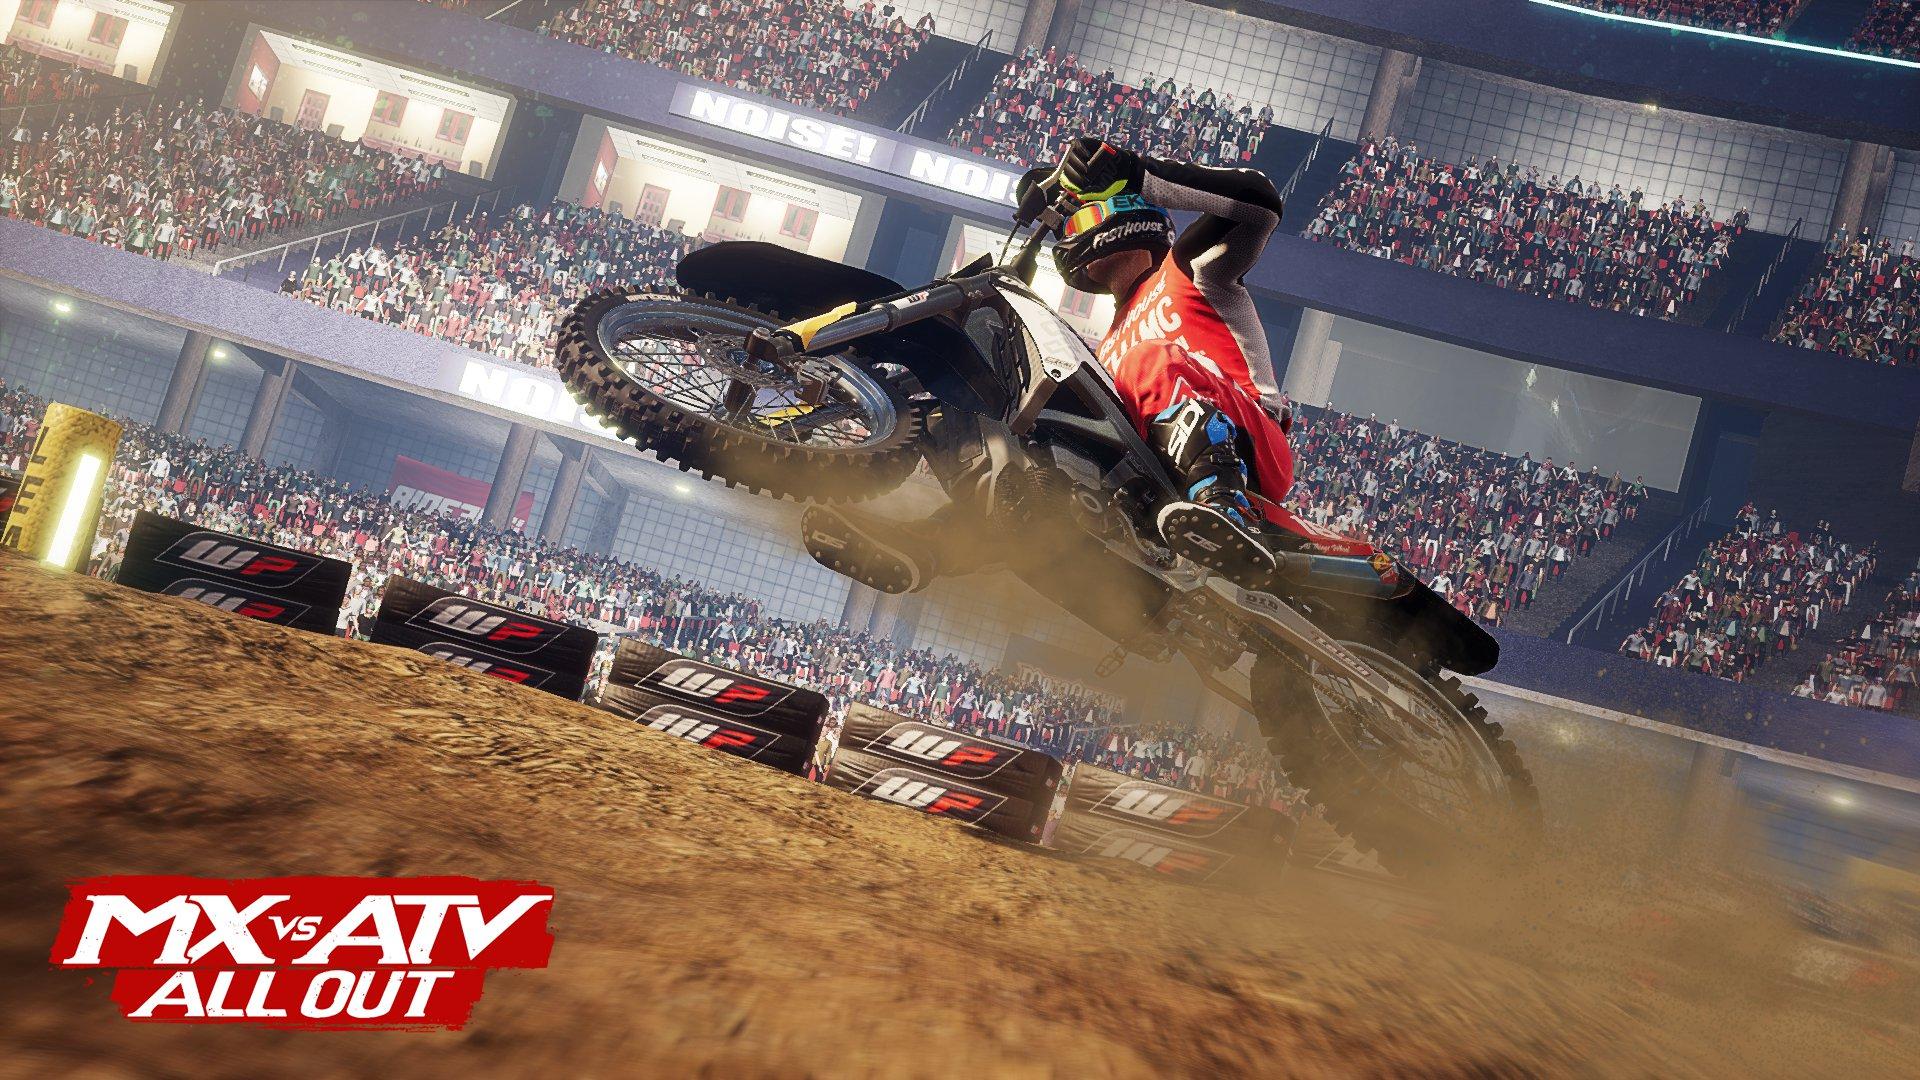 MX vs ATV All Out 8